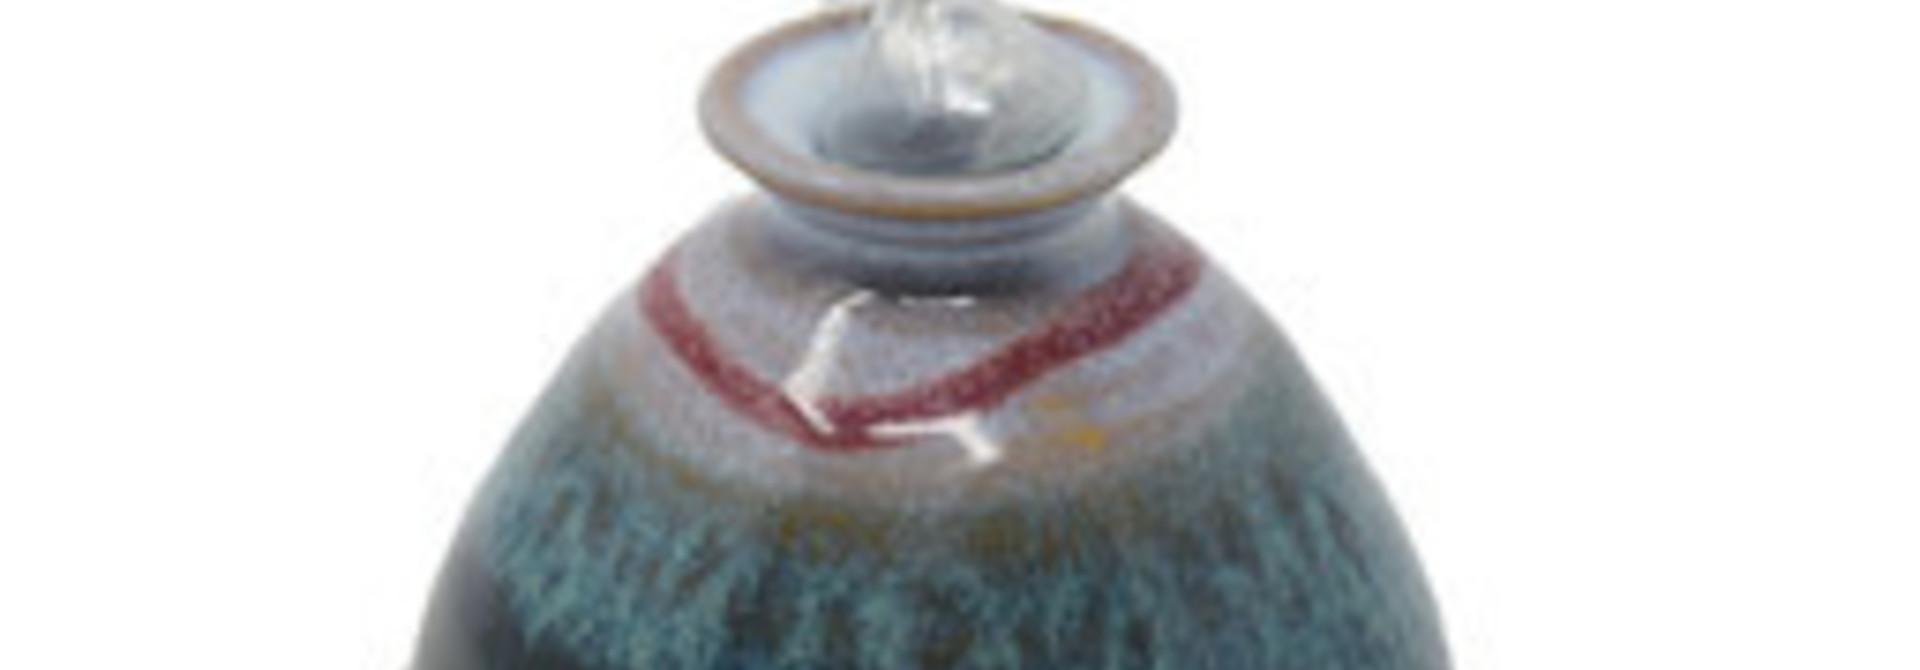 Tiny Oil Lamp